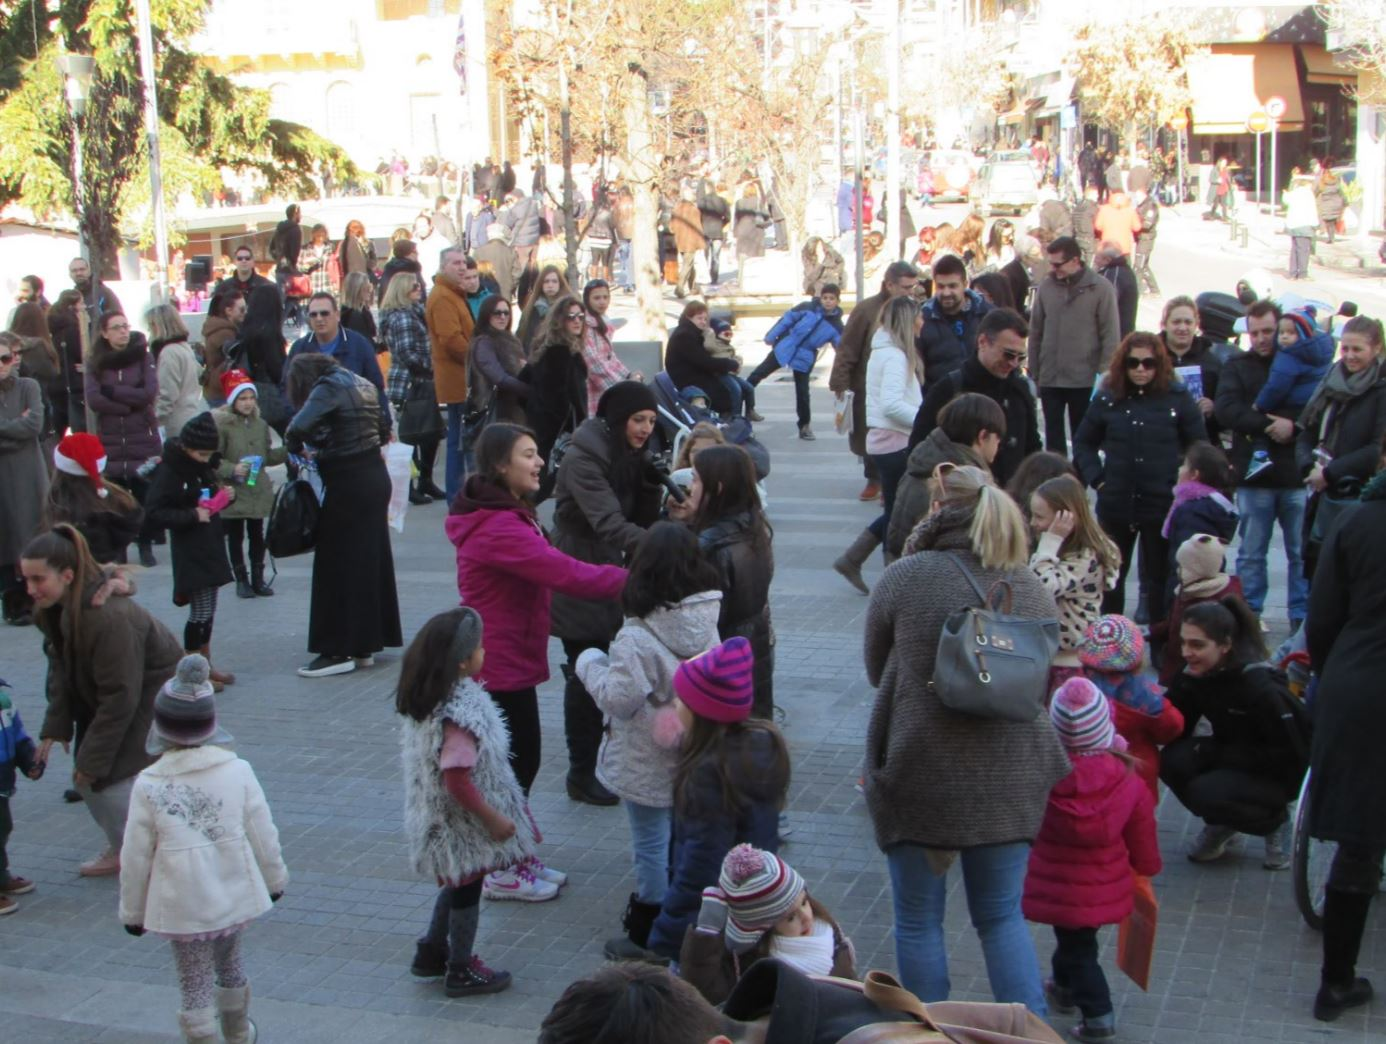 kozan.gr: Το Θεατρικό παιχνίδι από το ΔΗ.ΠΕ.ΘΕ. Κοζάνης, μπροστά από το δημαρχείο της πόλης, που άρεσε στα παιδιά (Βίντεο)